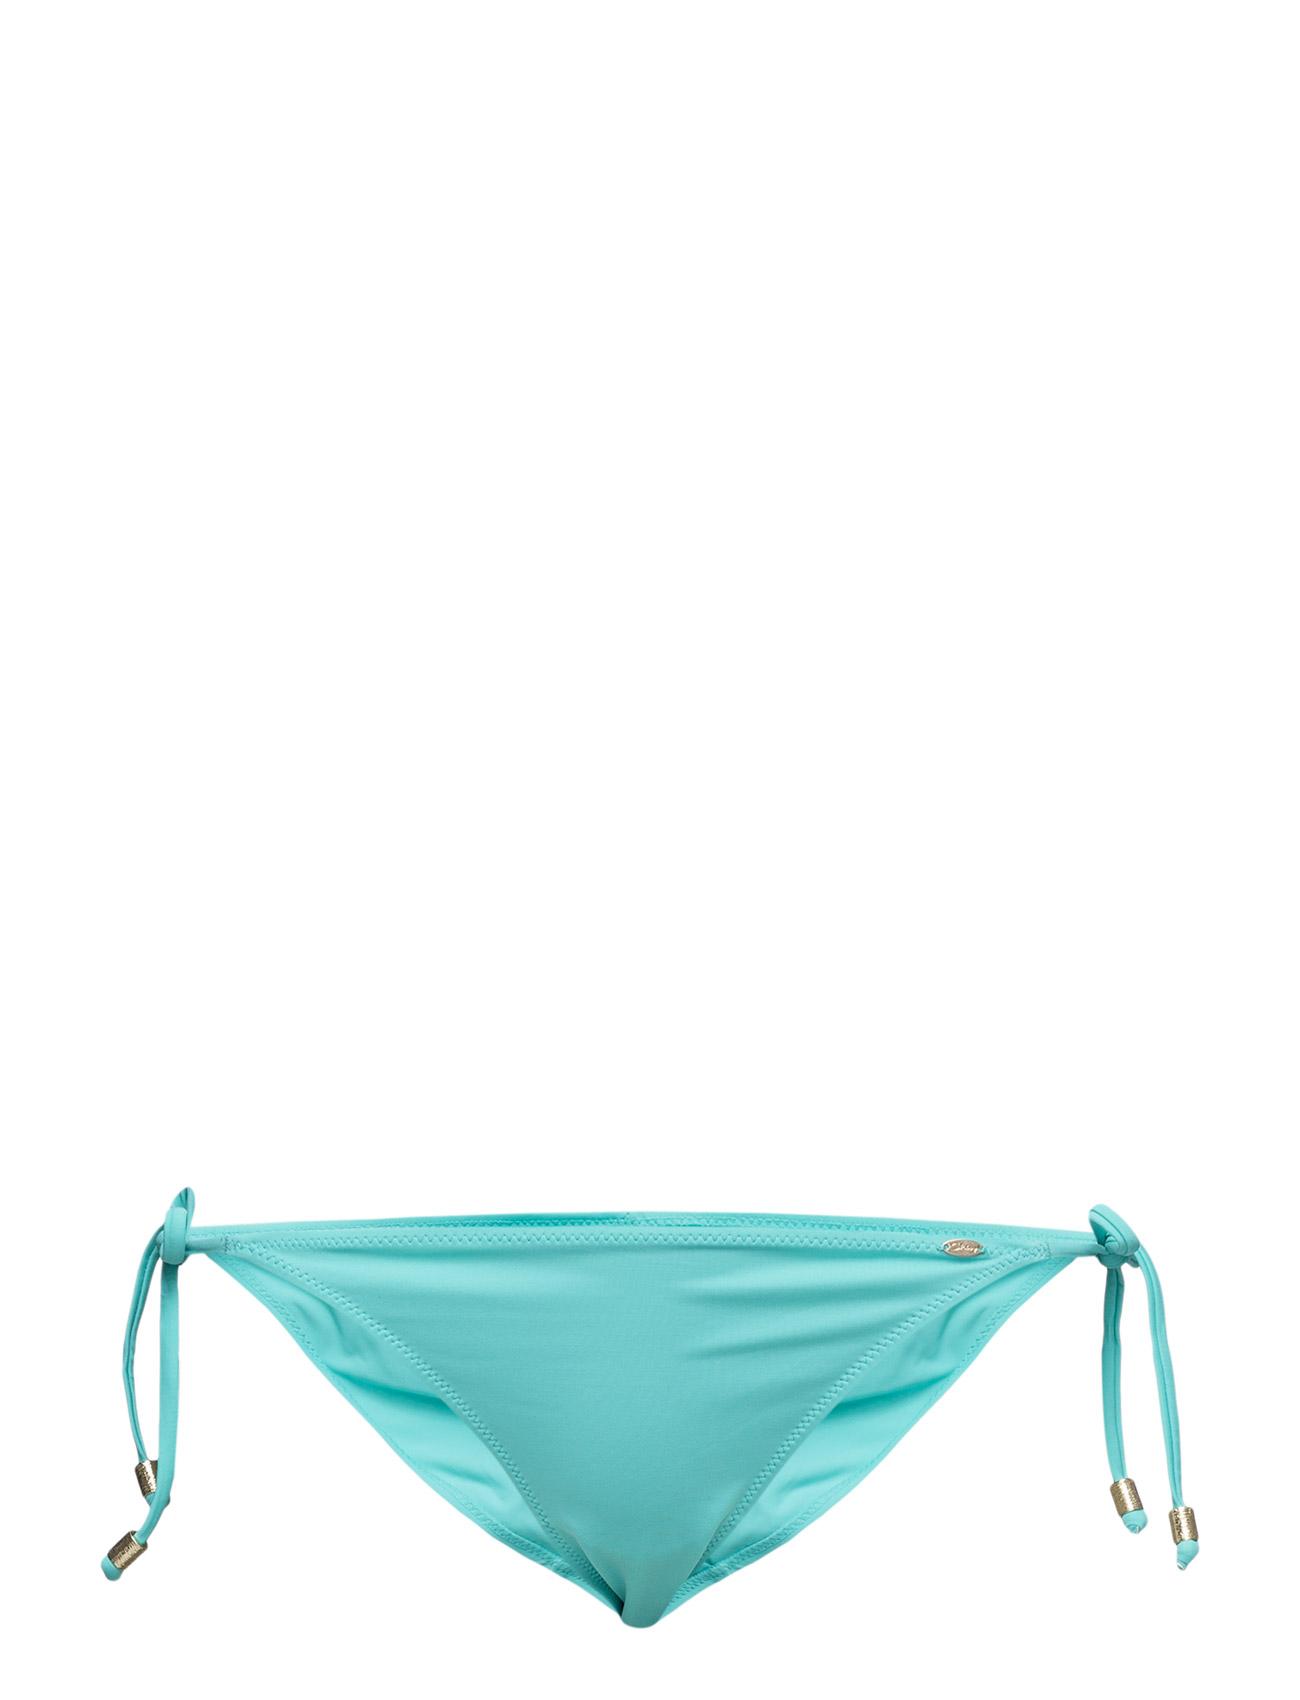 L. Brasiliano Skiny Badetøj til Kvinder i